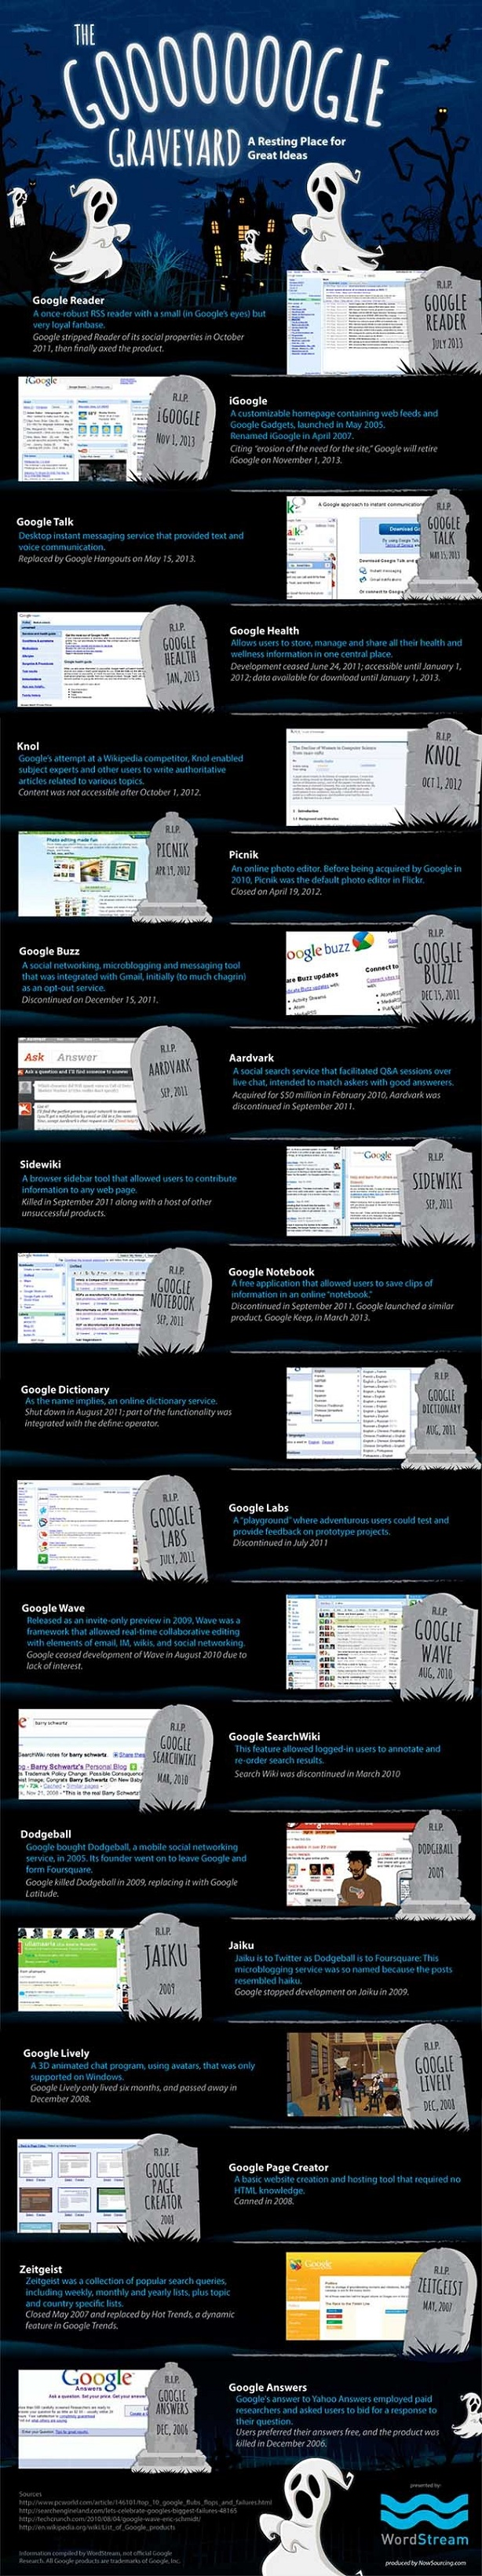 infografia cementerio Google